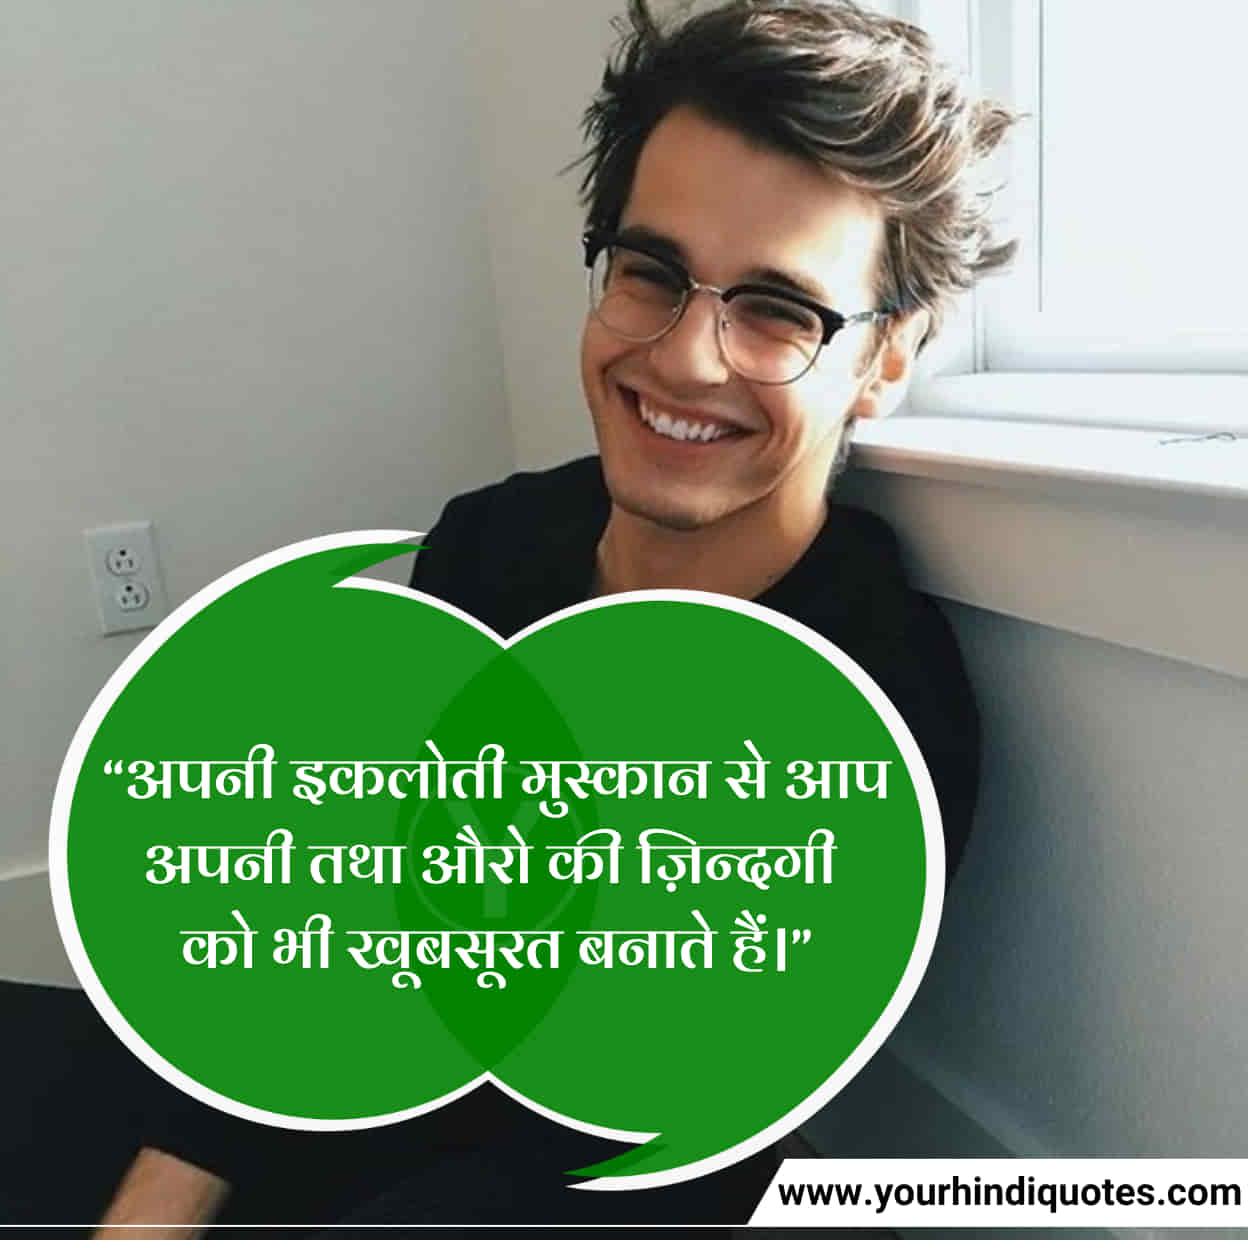 Cute Happy Smile Quotes